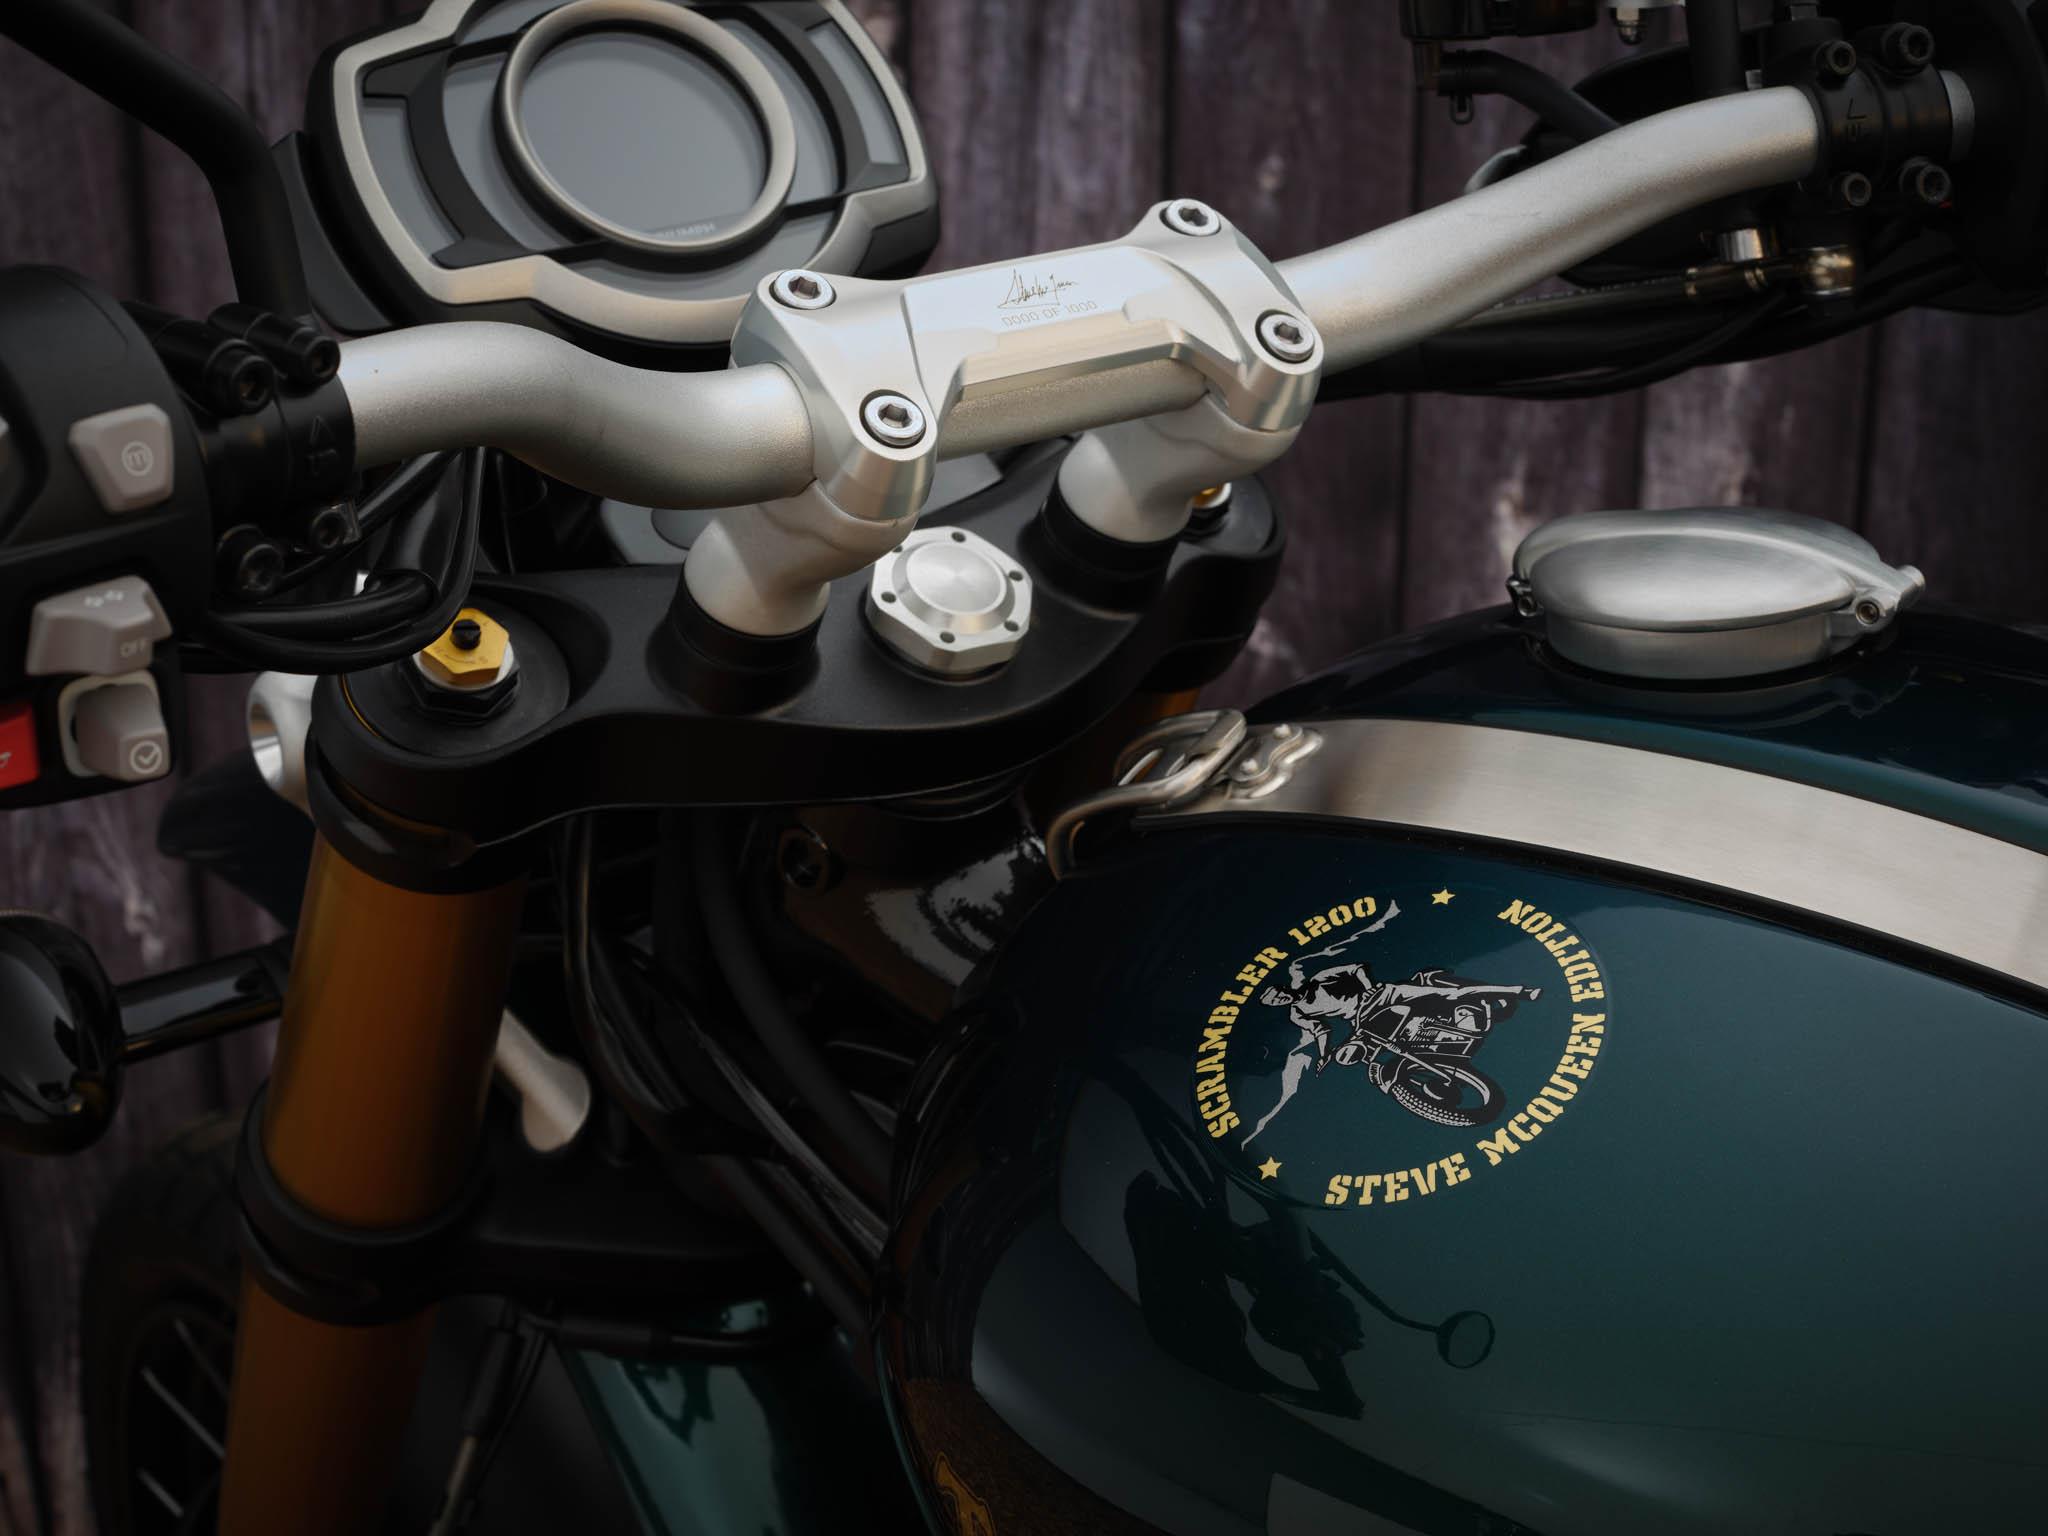 Triumph_Scrambler_1200_Steve_McQueen_Details_2021-1